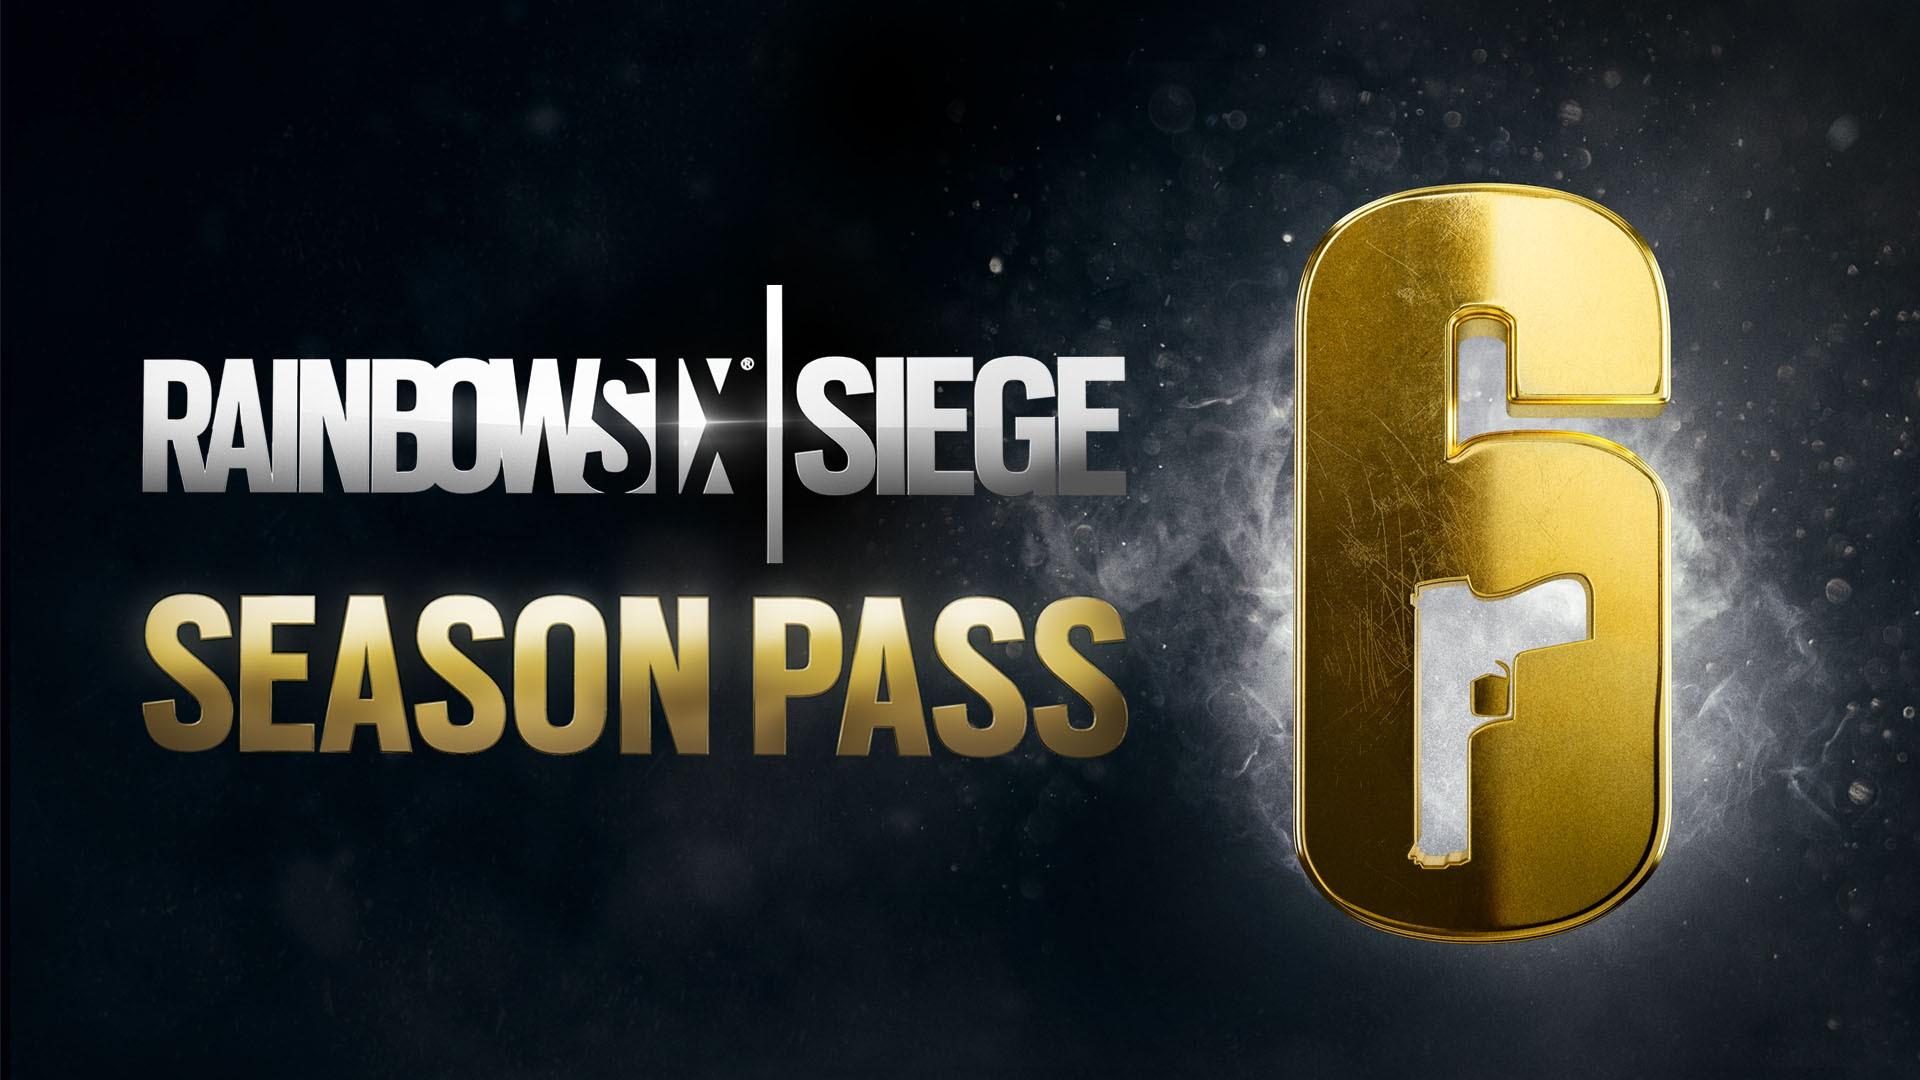 Tom Clancy's Rainbow Six Siege SEASON PASS